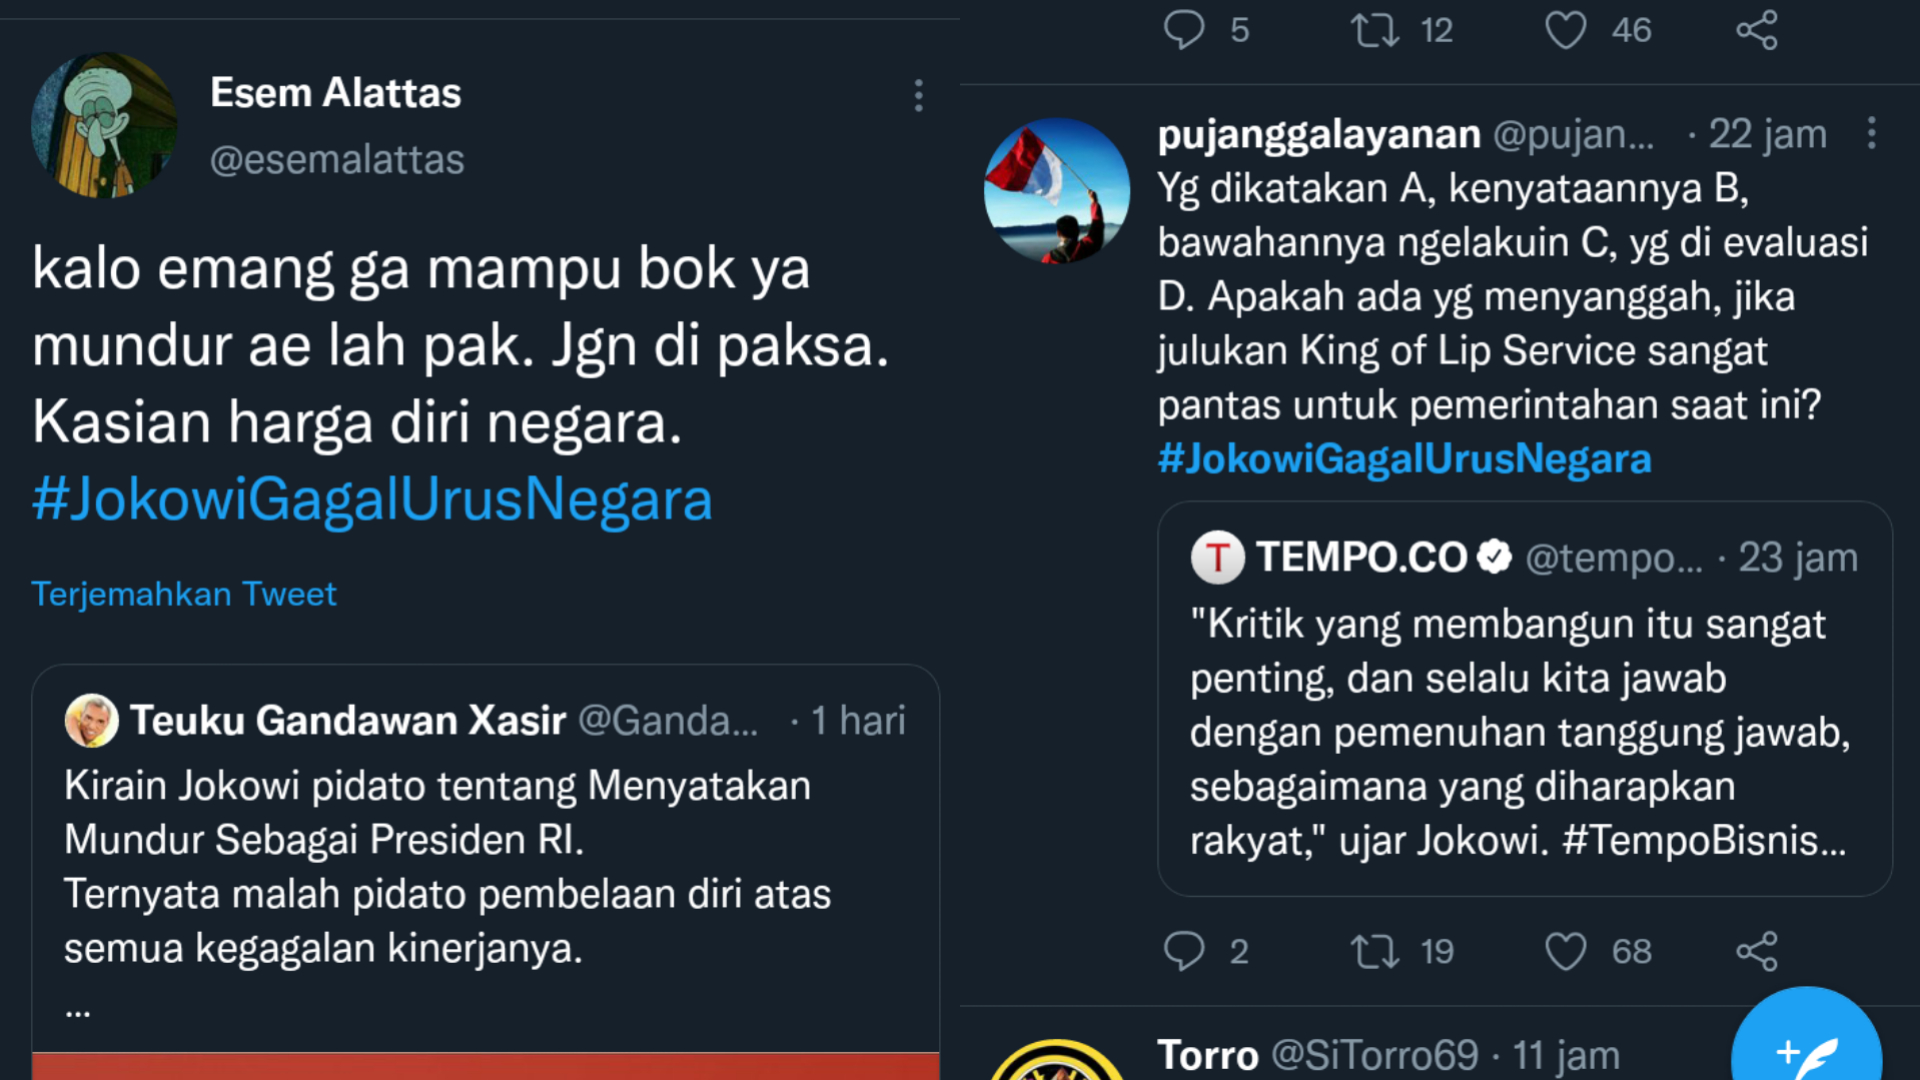 Trending Tagar #JokowiGagalUrusNegara, Netizen: Kalau Memang Sudah Tak Mampu, Mending Mundur Saja Pak!